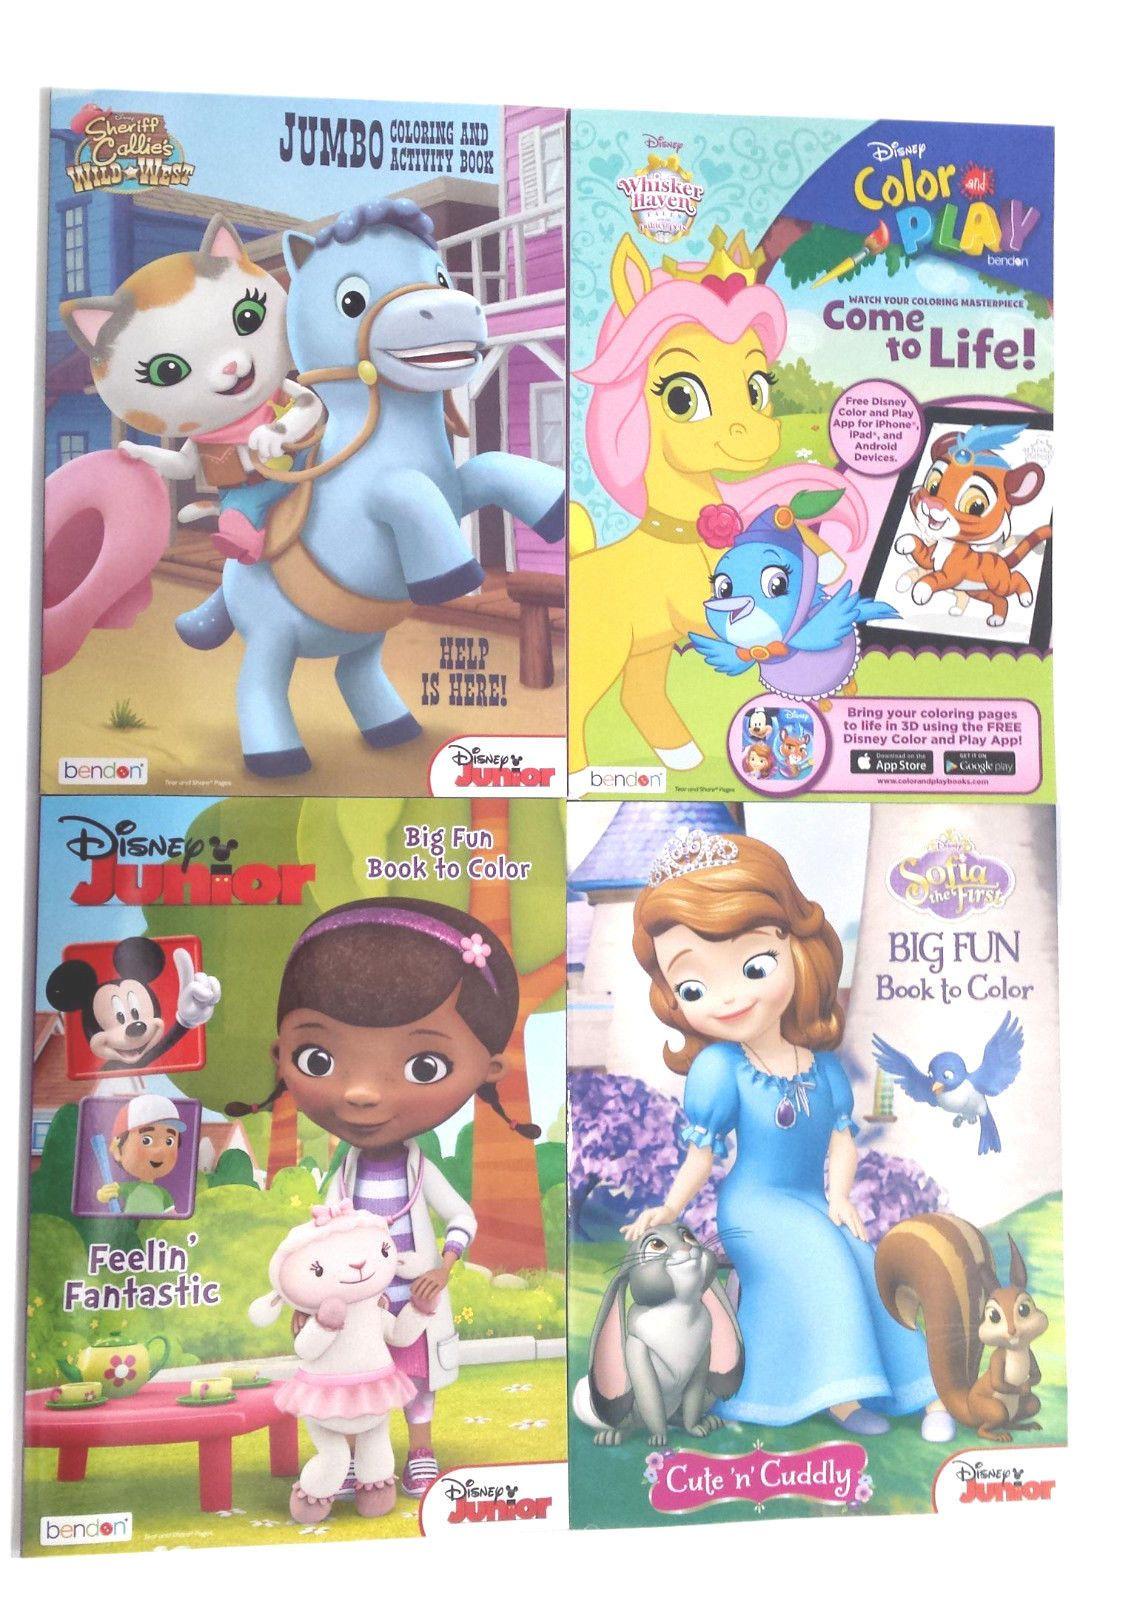 Craft Books 134568 Disney Junior Girls Coloring Book And Jumbo Kids Activity Books Set Of 4 New Buy It N Kids Activity Books Book Activities Coloring Books